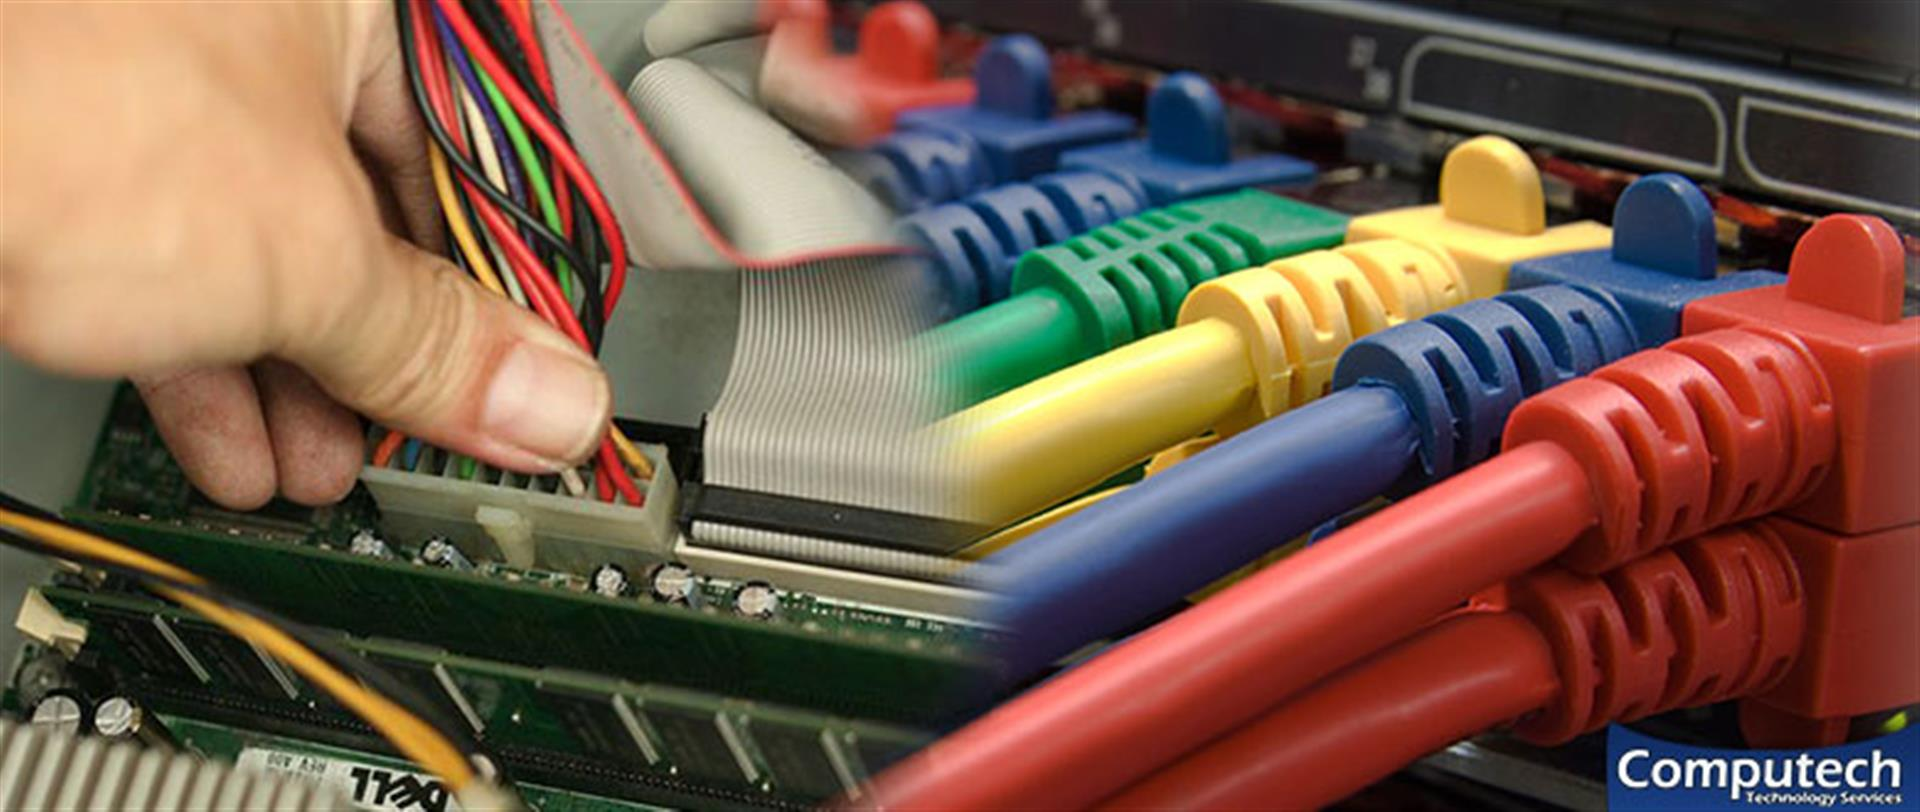 Jacksonville Alabama Onsite PC & Printer Repairs, Network, Telecom & Data Cabling Solutions